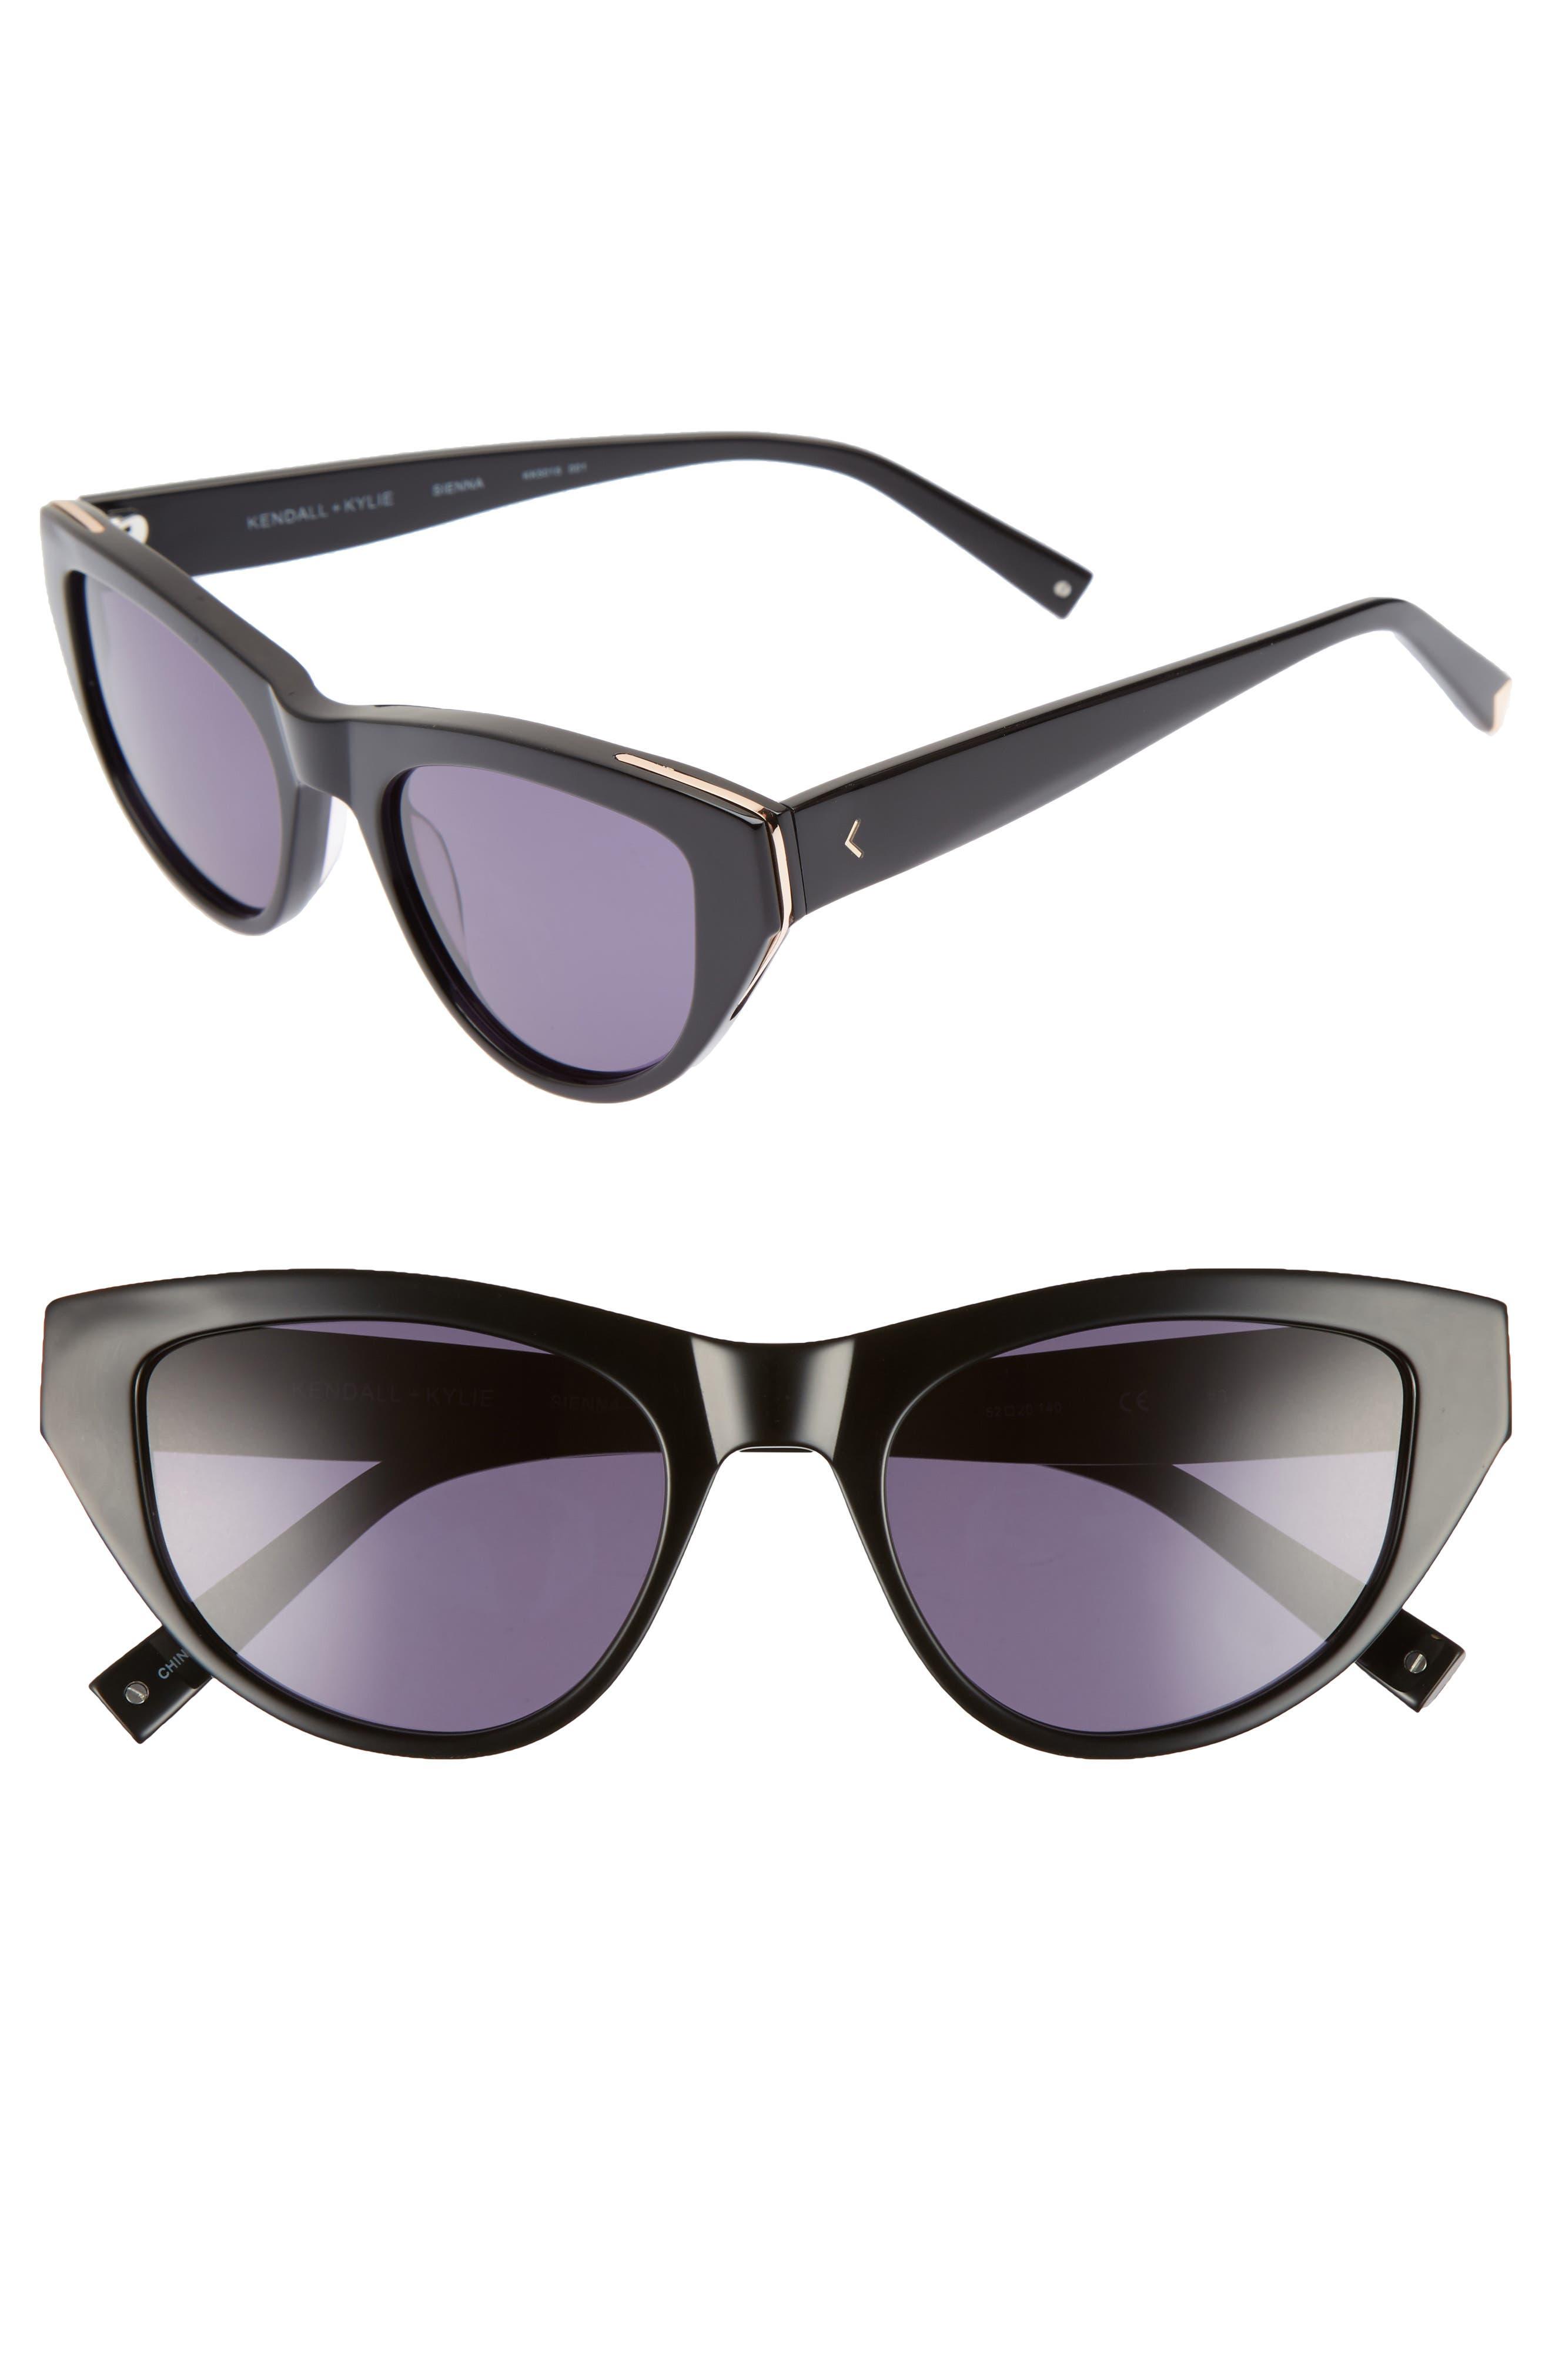 Sienna 52mm Retro Cat Eye Sunglasses,                             Main thumbnail 2, color,